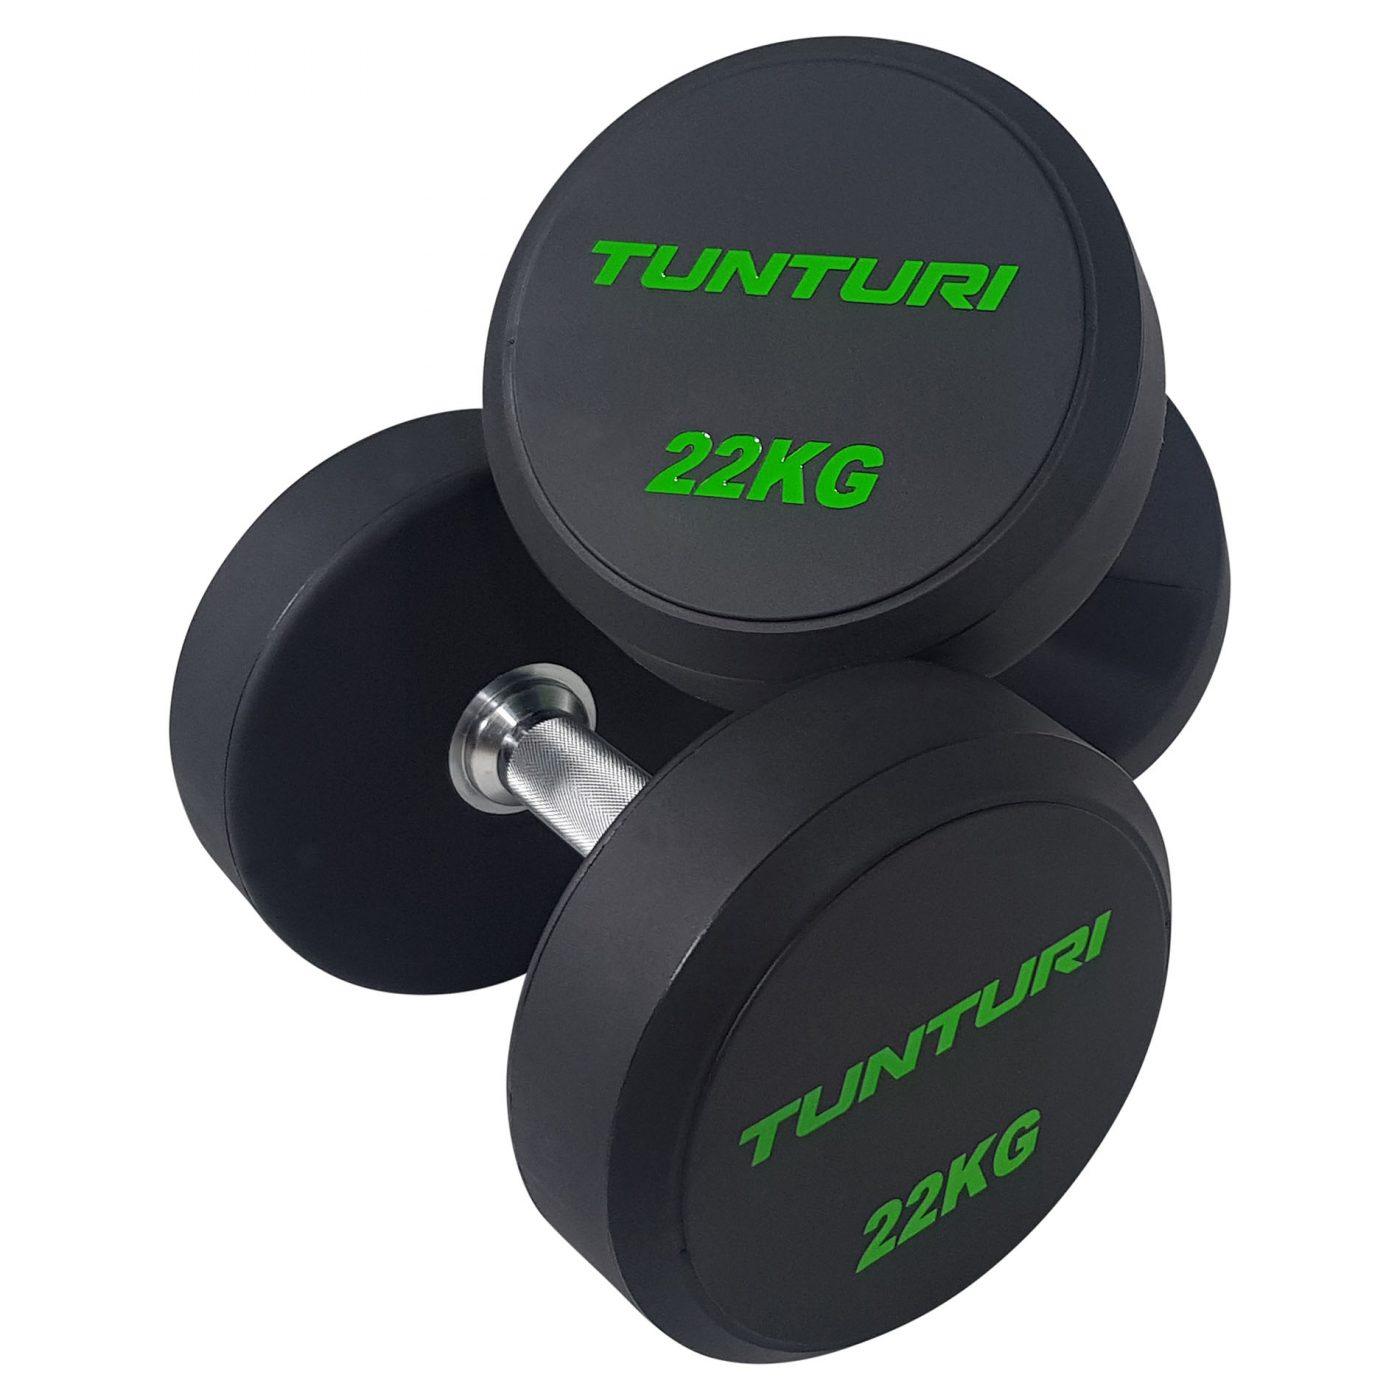 Tunturi Pro PU Dumbbell Set 14 t/m 32 kg - 1 paar - (Halterset)